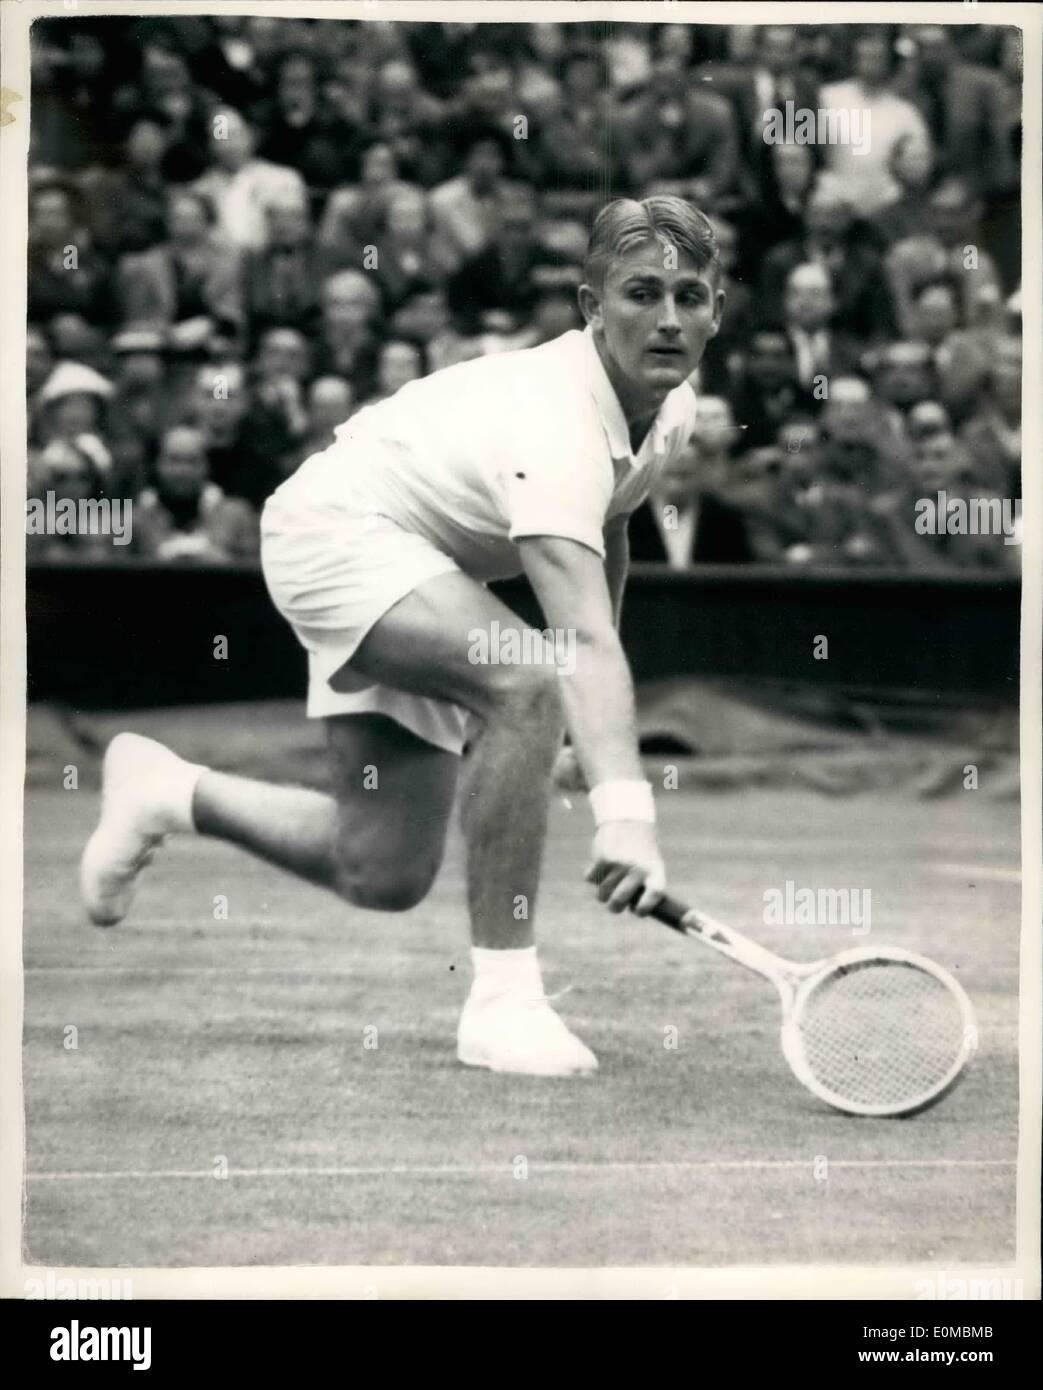 Jun 06 1954 Wimbledon Second week Hoad beaten by Drobny